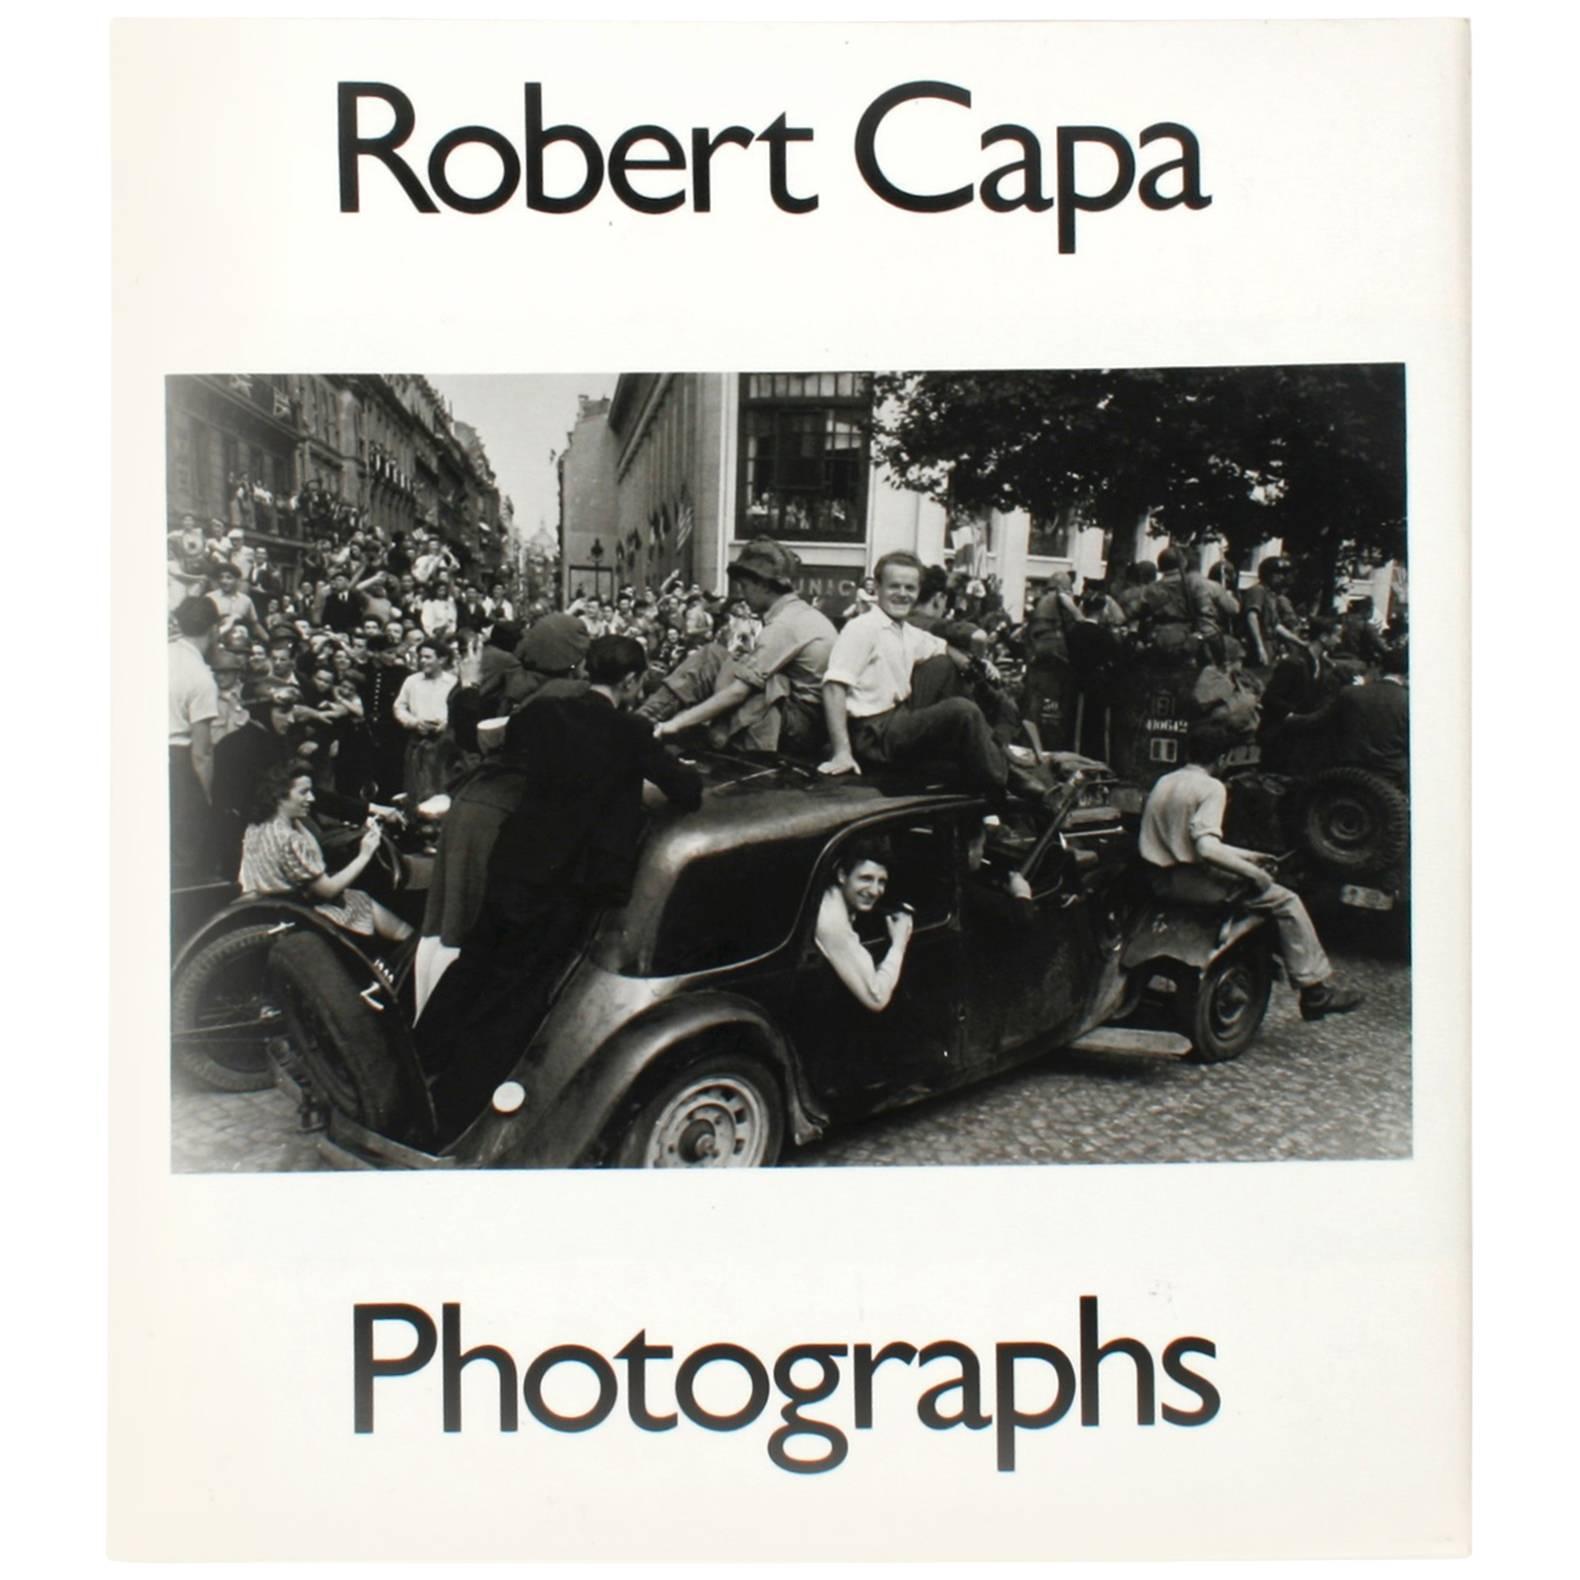 Robert Capa: Photographs, First Edition by Robert & Cornell Capa